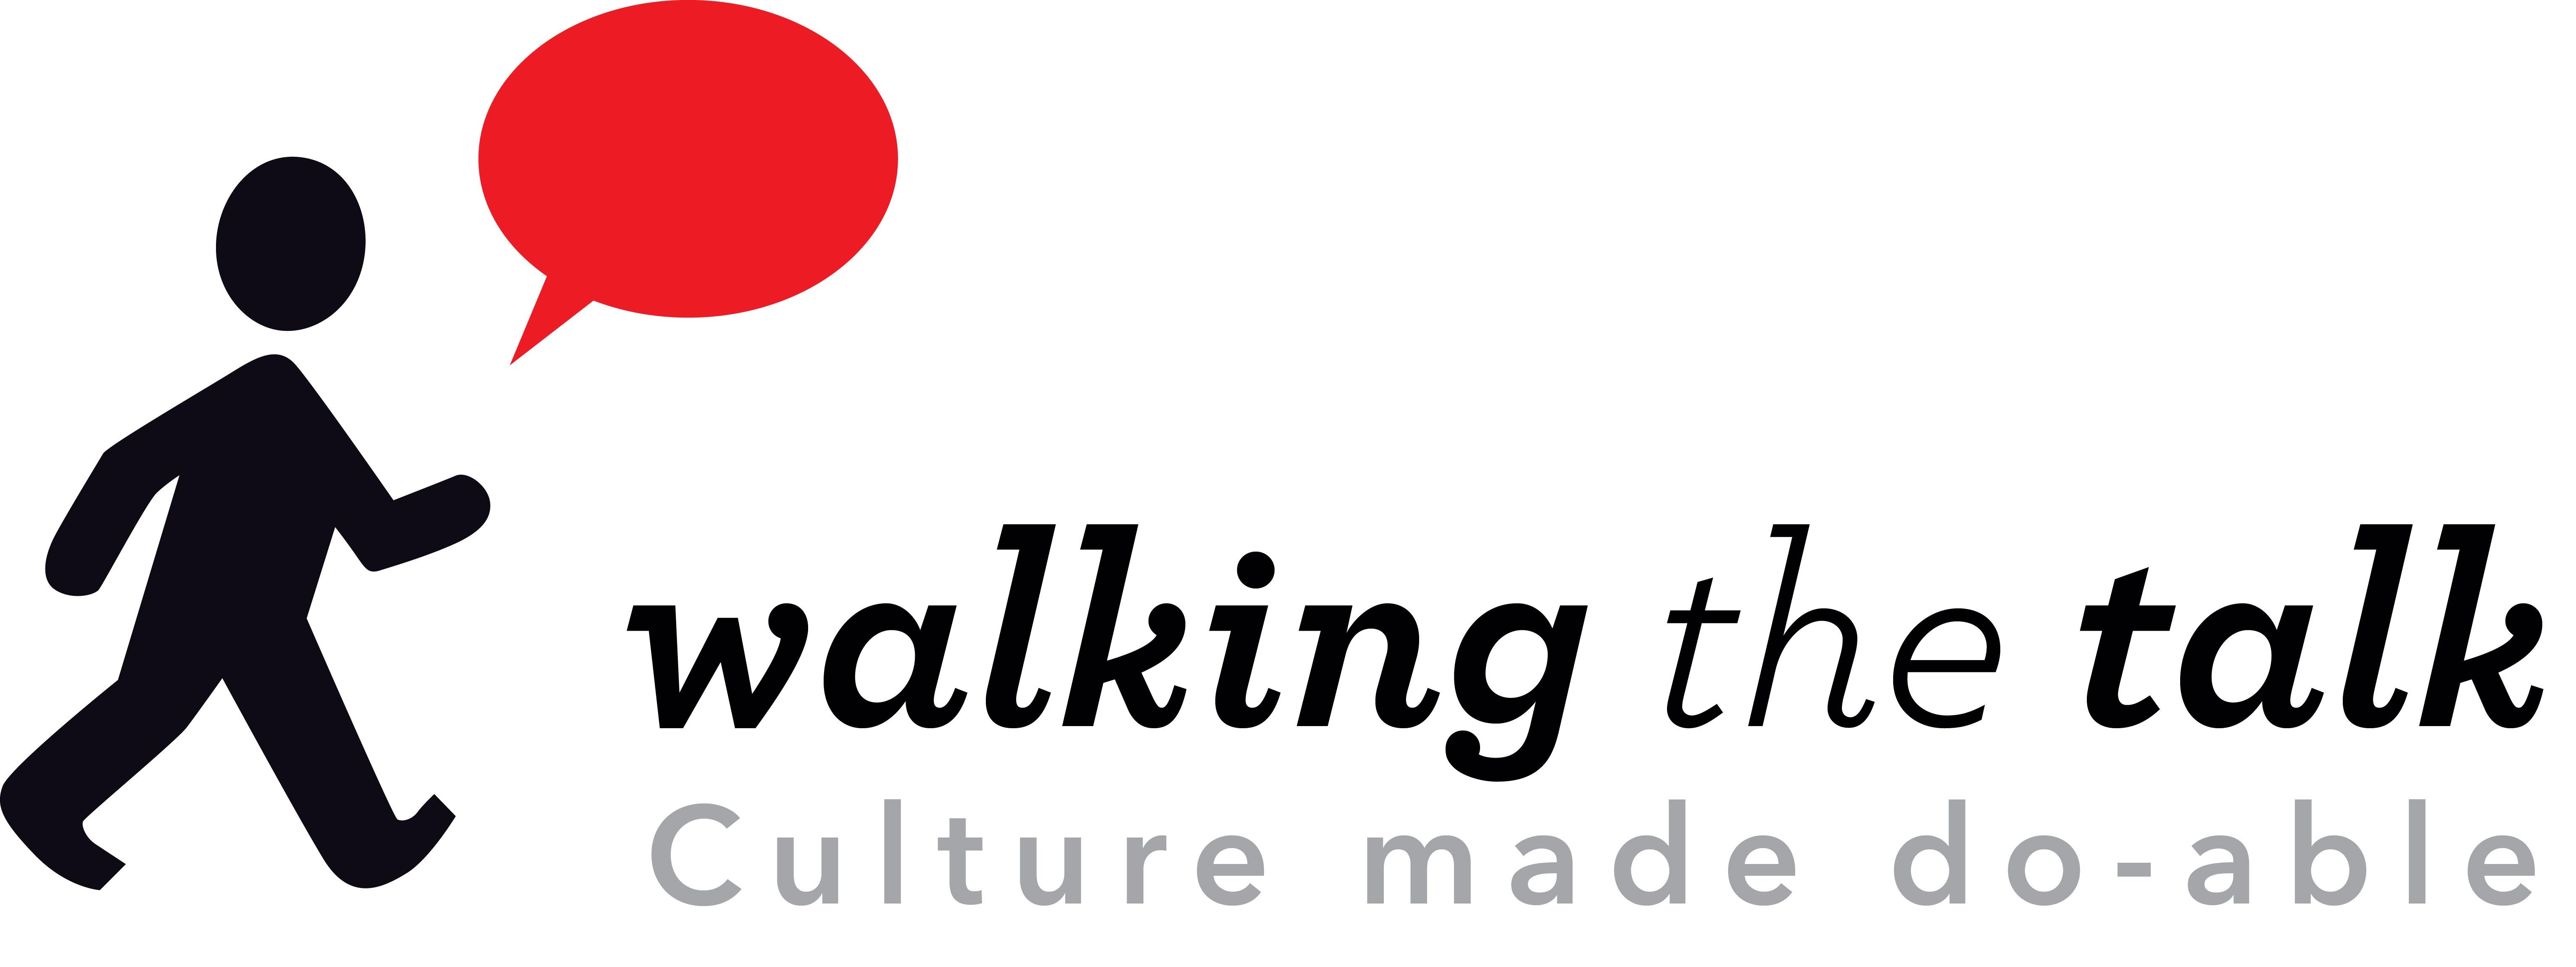 WTT Master logo Culture made do-able 150924.jpg